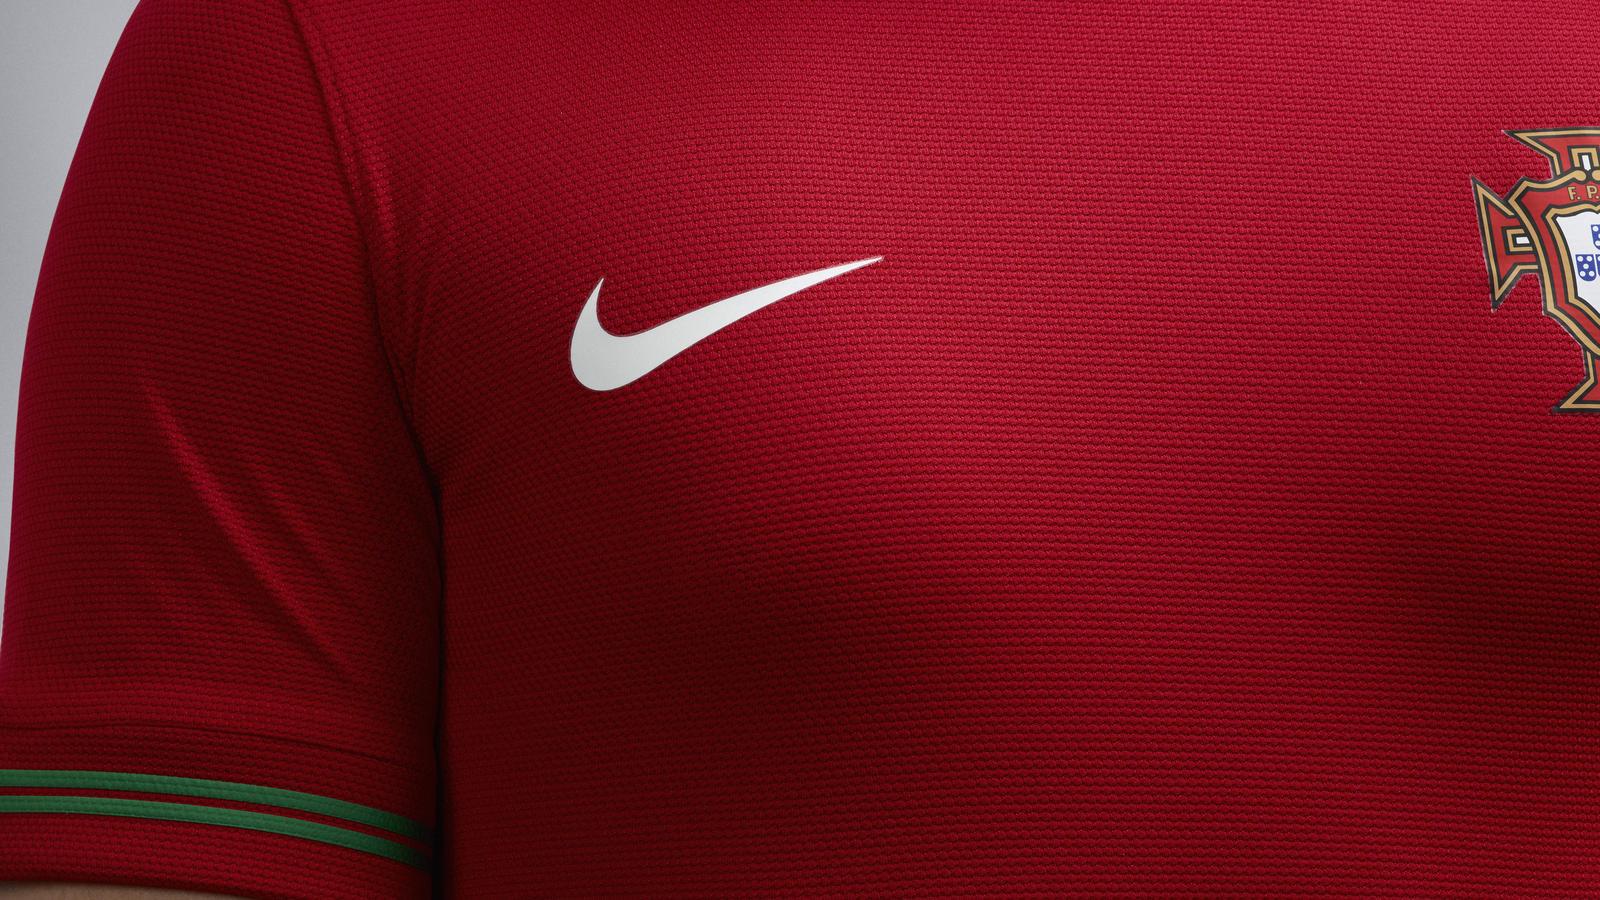 Portugal 2012 National Team Home Kit - Nike News